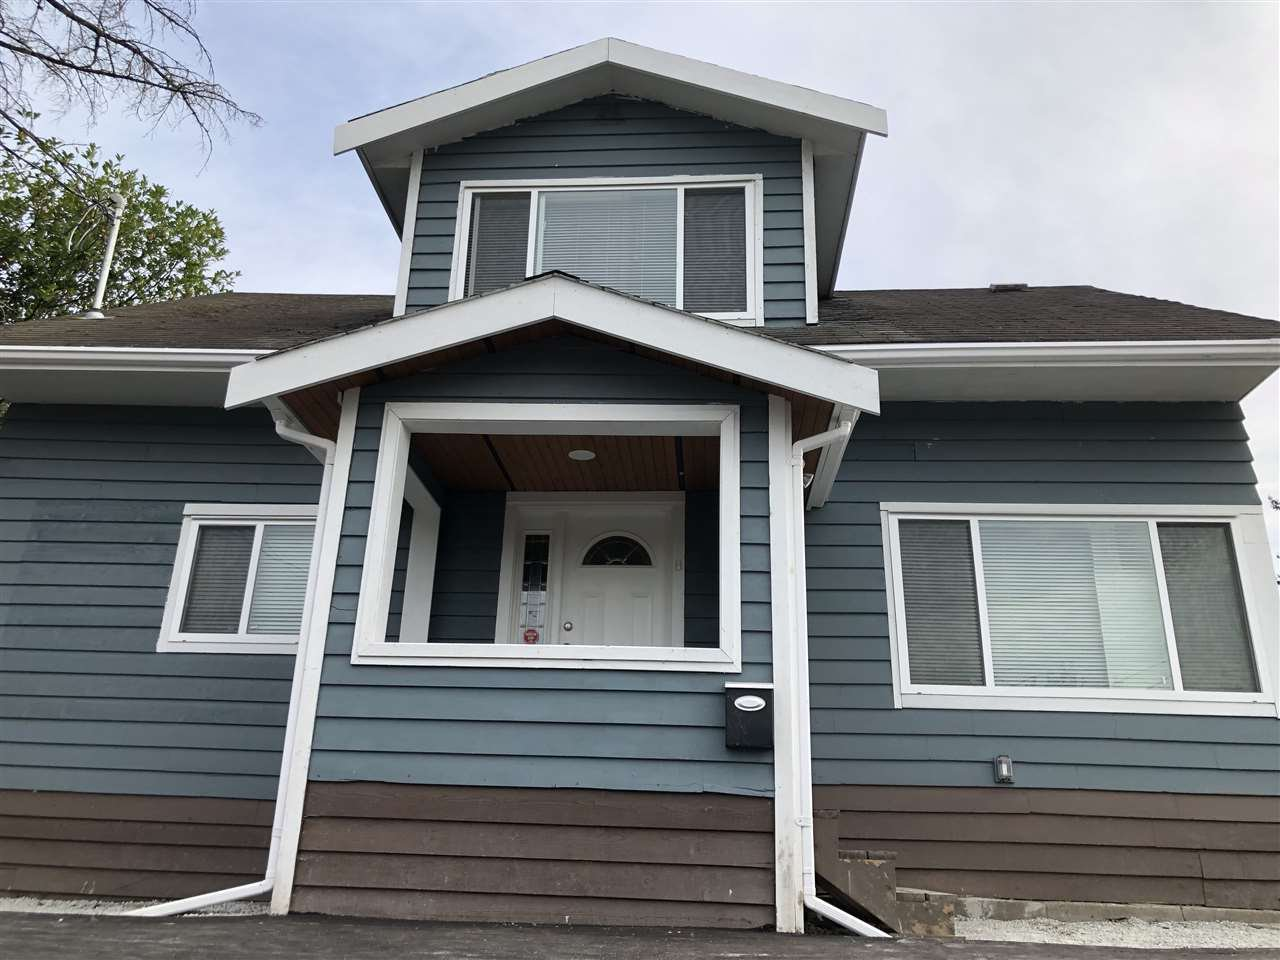 Main Photo: 12728 114A Avenue in Surrey: Bridgeview House for sale (North Surrey)  : MLS®# R2523868